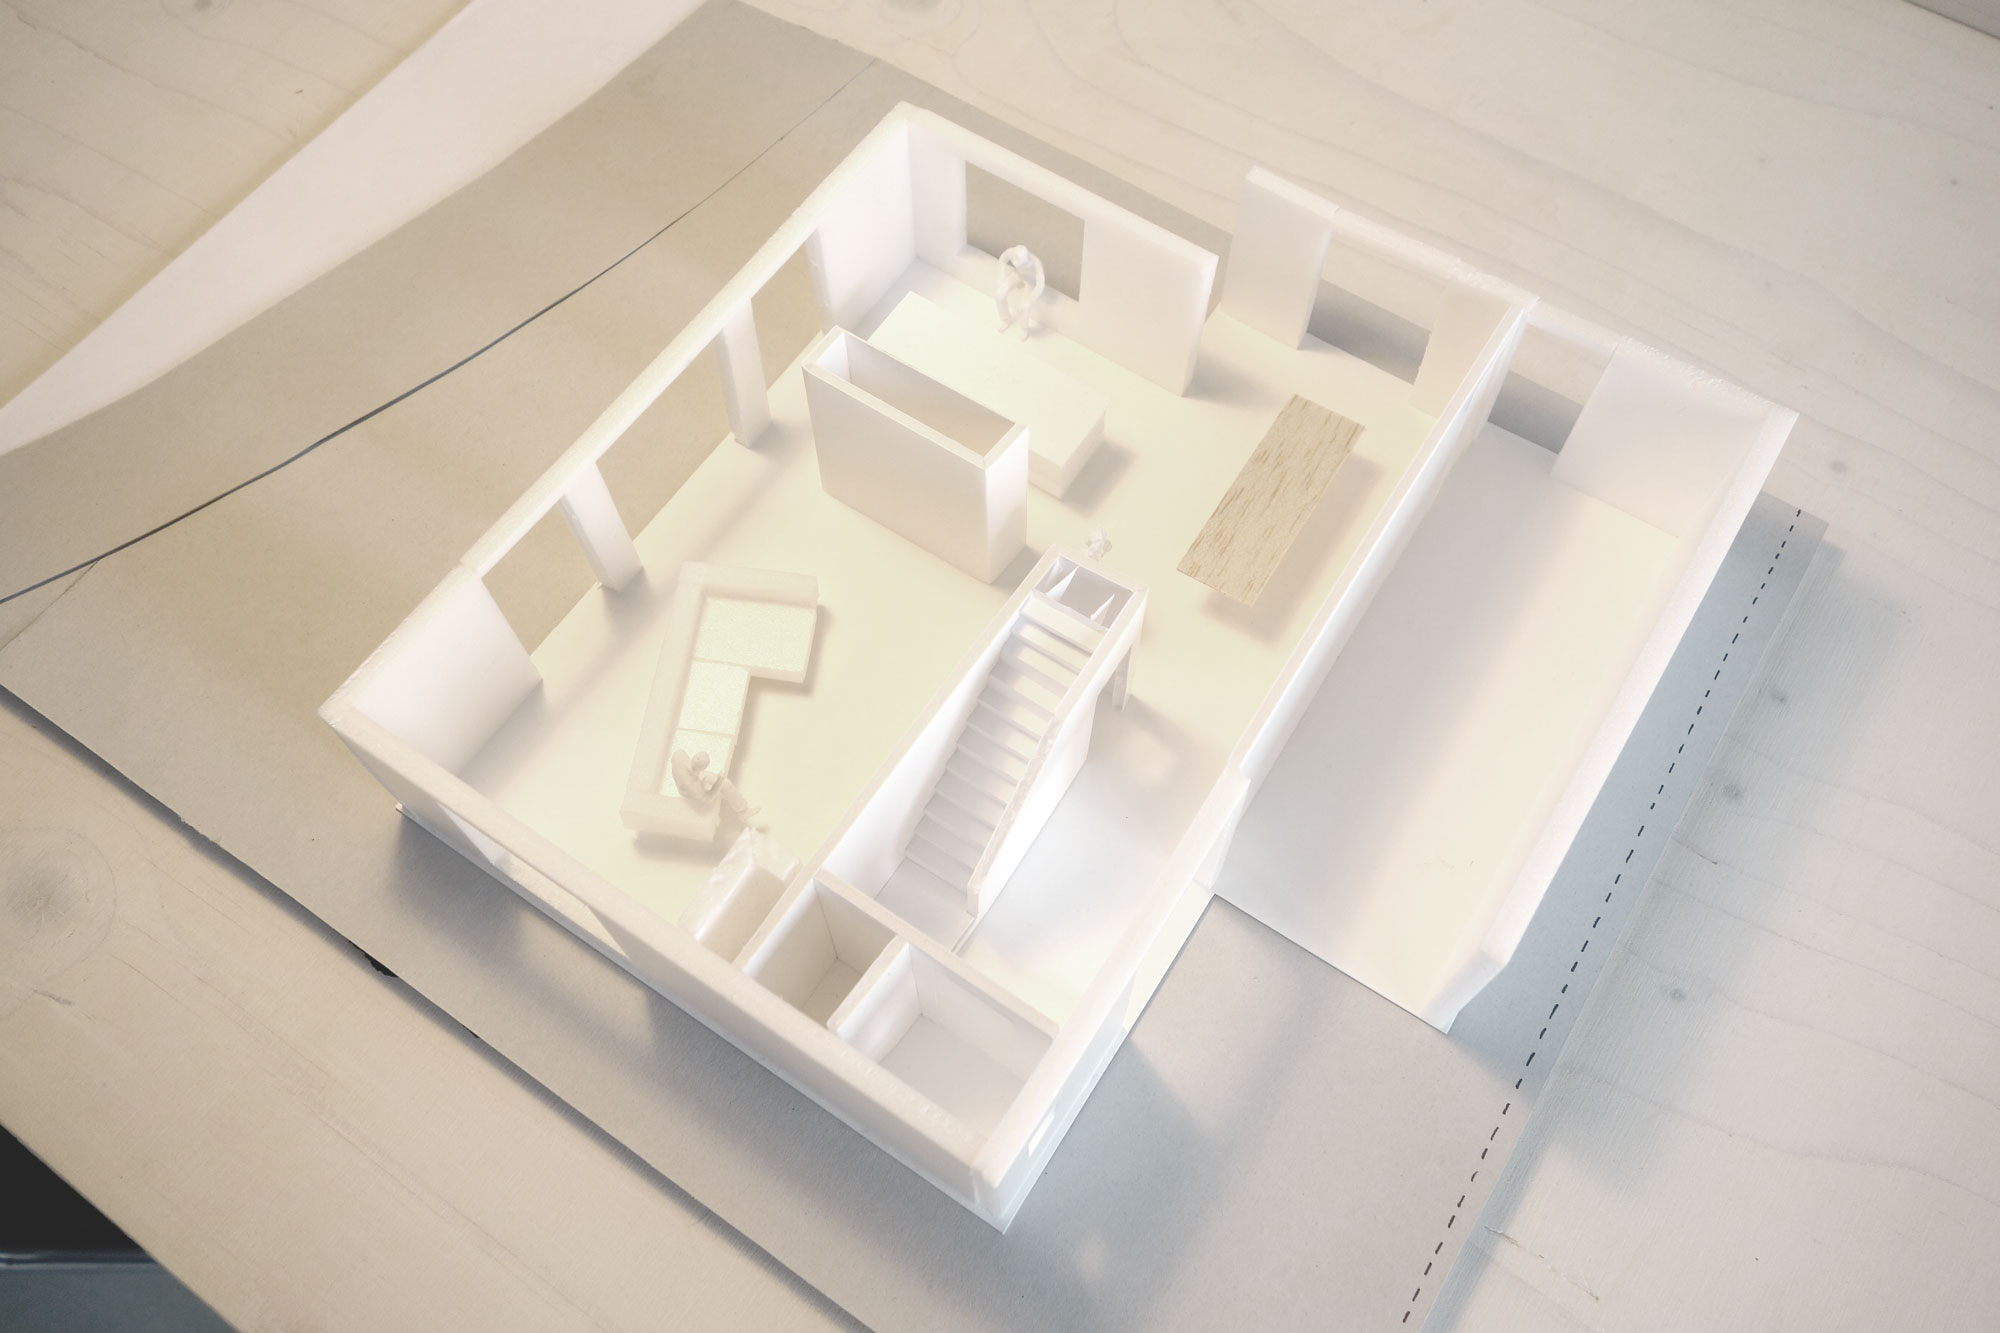 maquette_vrijstaand_huis_architectuur